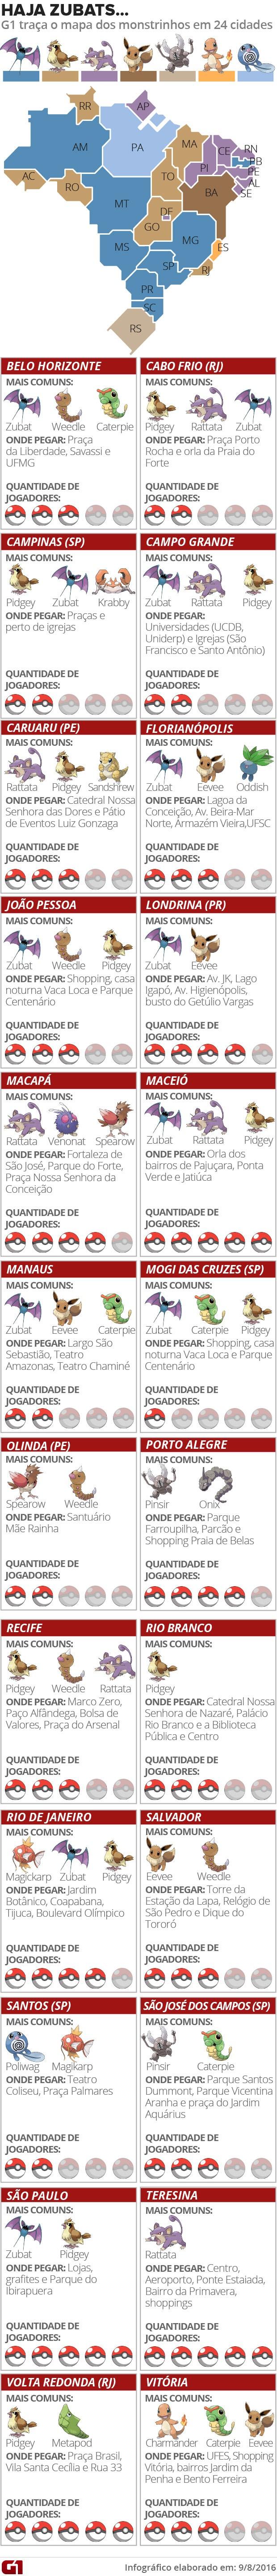 Mapa do jogo 'Pokémon Go' no Brasil (Foto: G1)